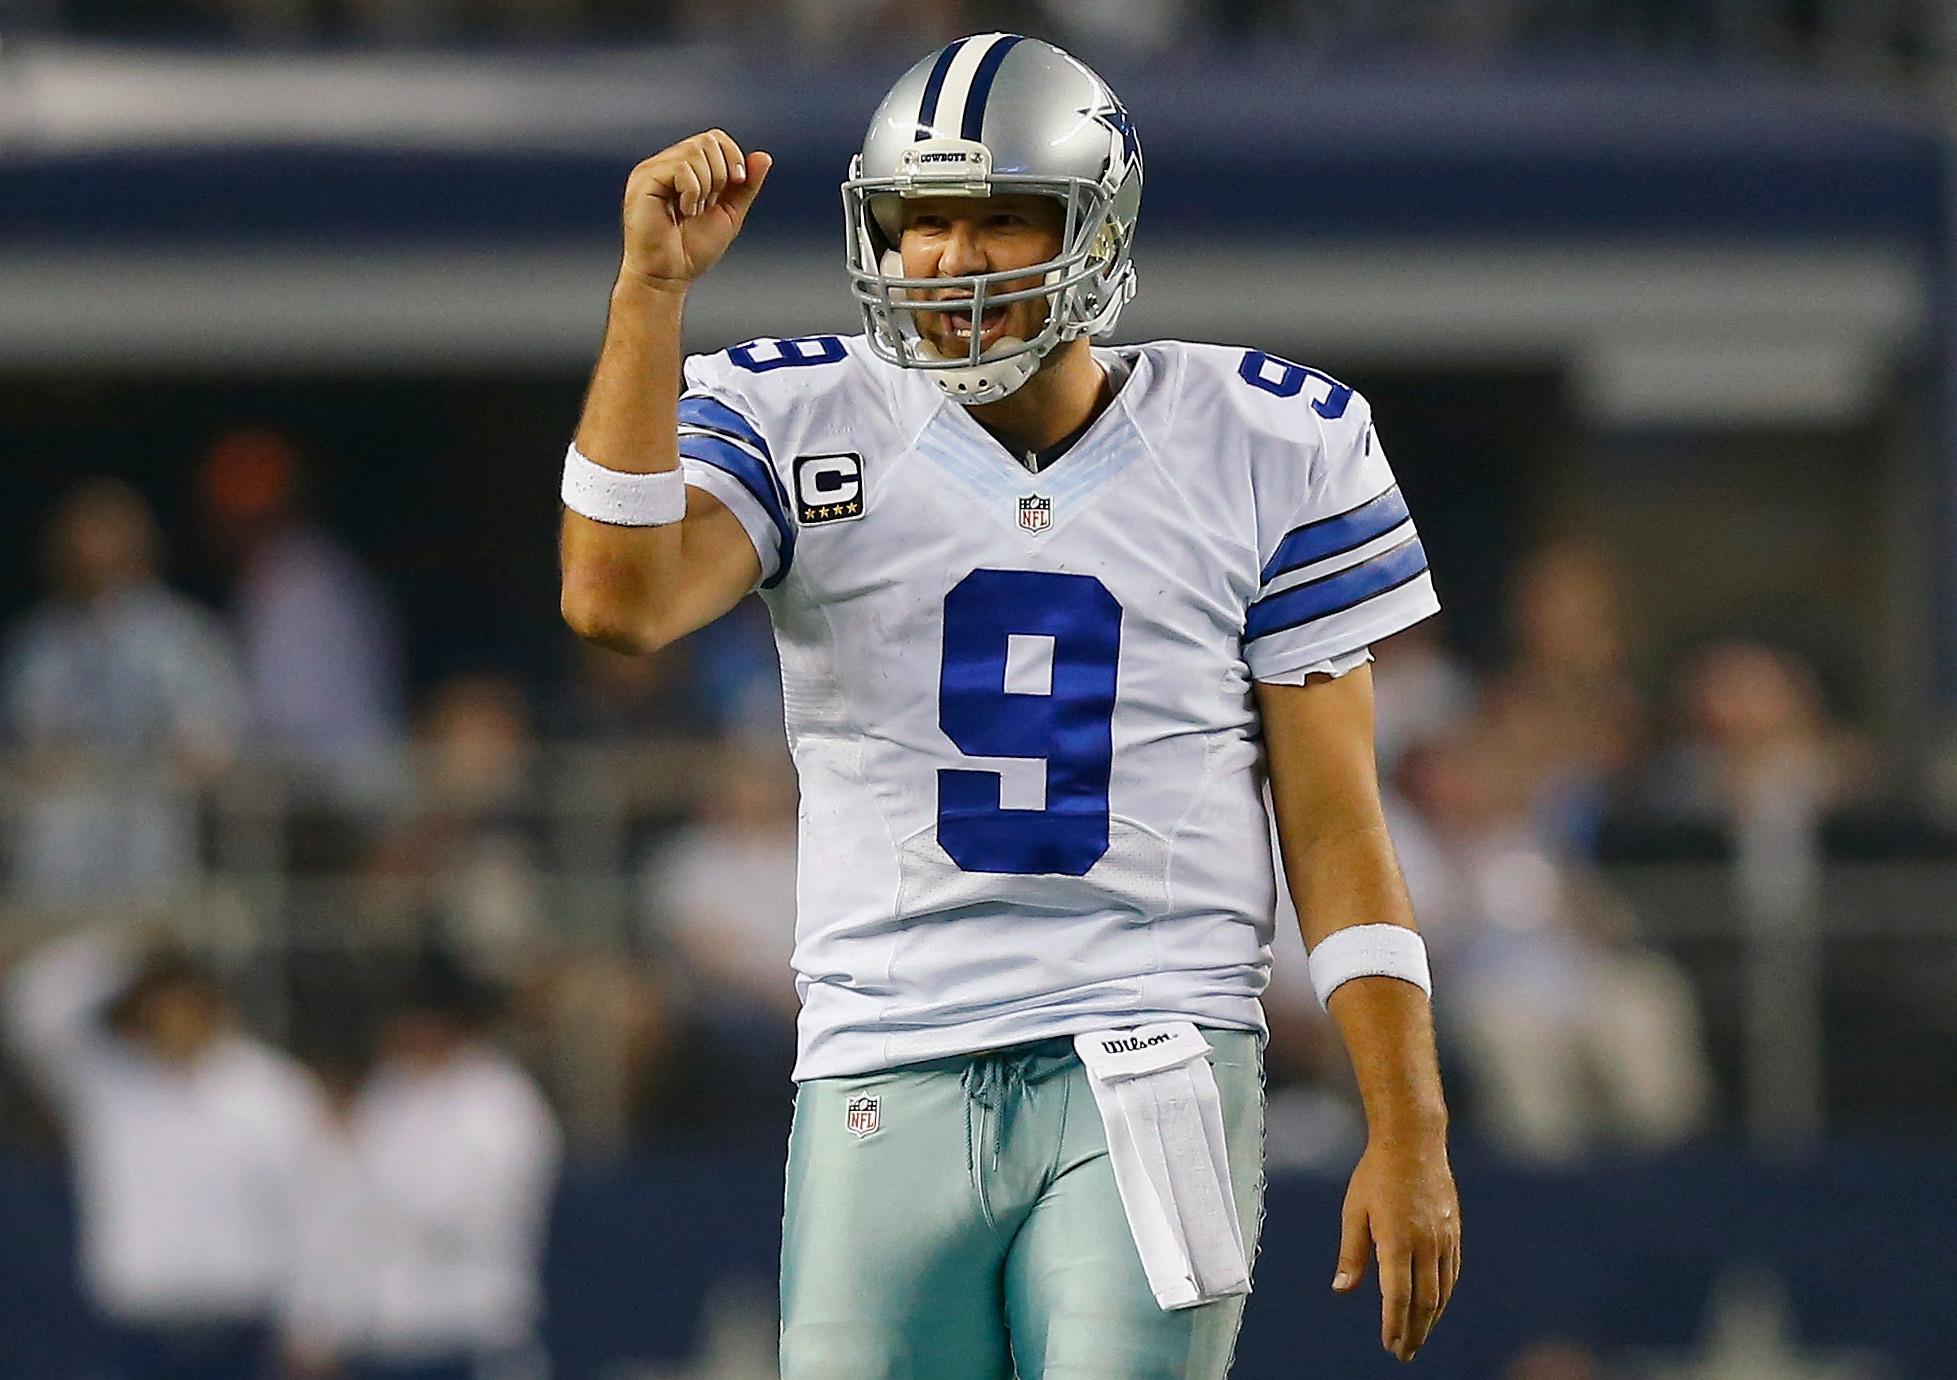 Tony Romo Has a Lot in Common With the Dallas Cowboys New Quarterback